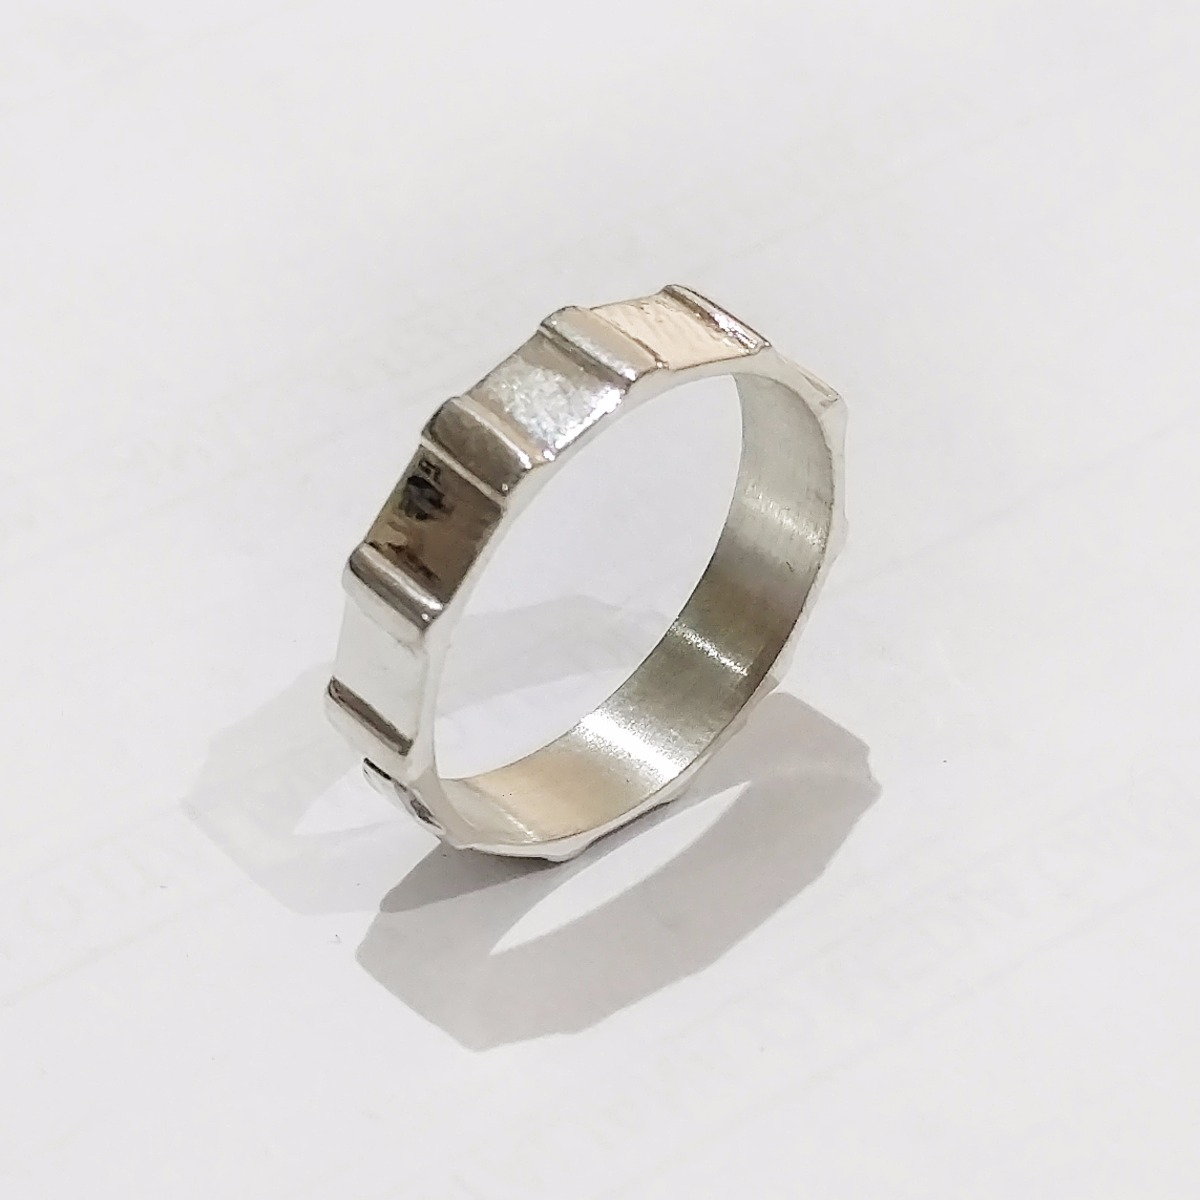 1ee3dad9b742 anillo plata 925 modelo rosario vasco varias medidas gtía. Cargando zoom.